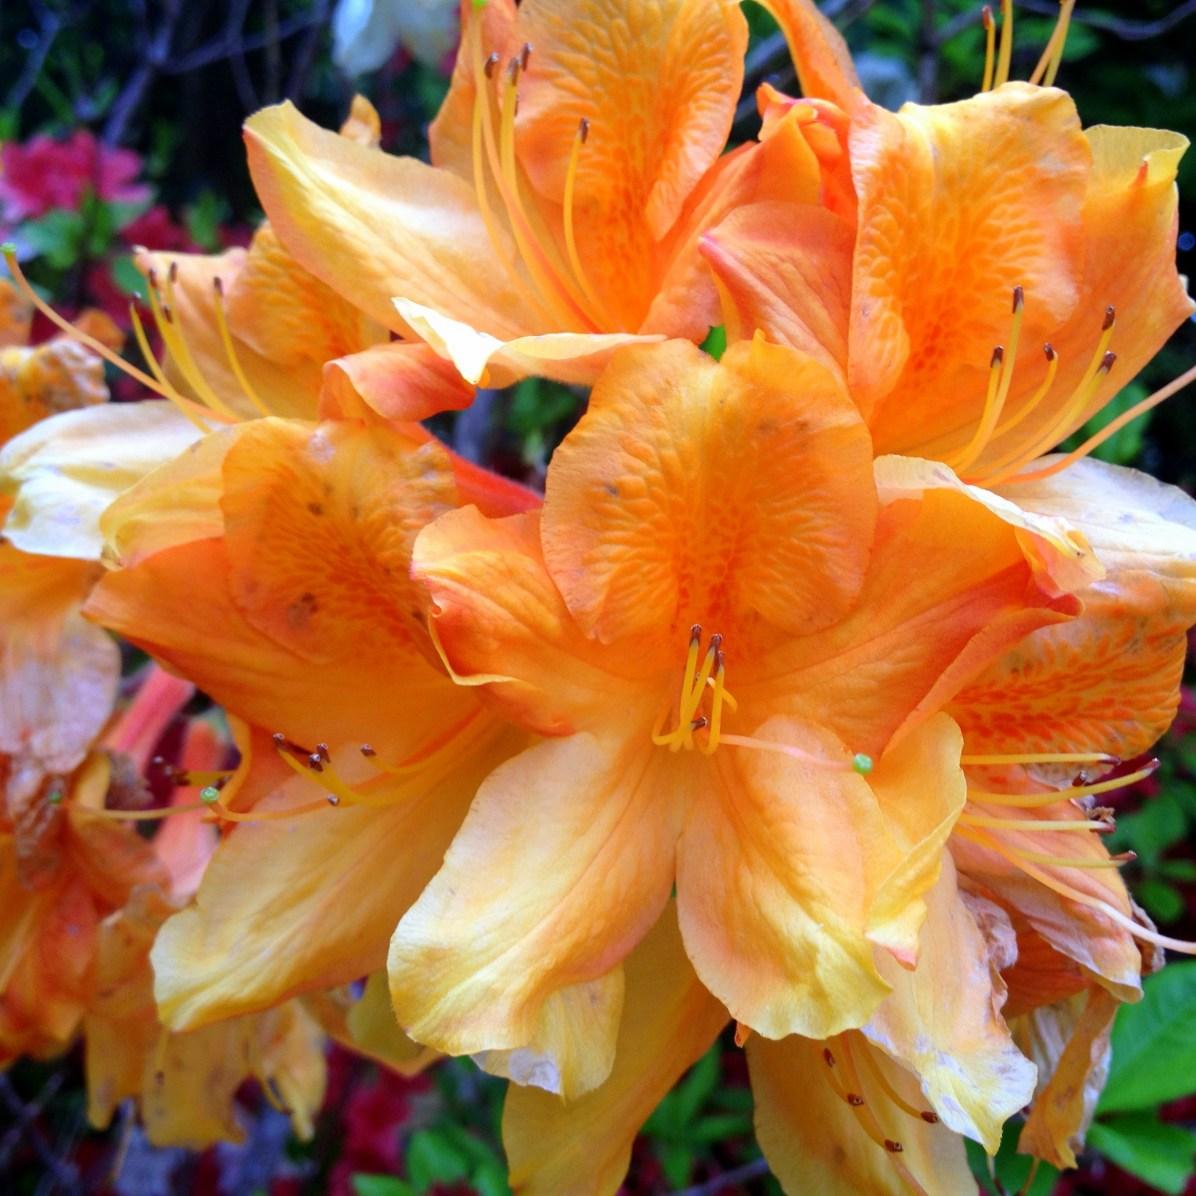 Garden flowers 4